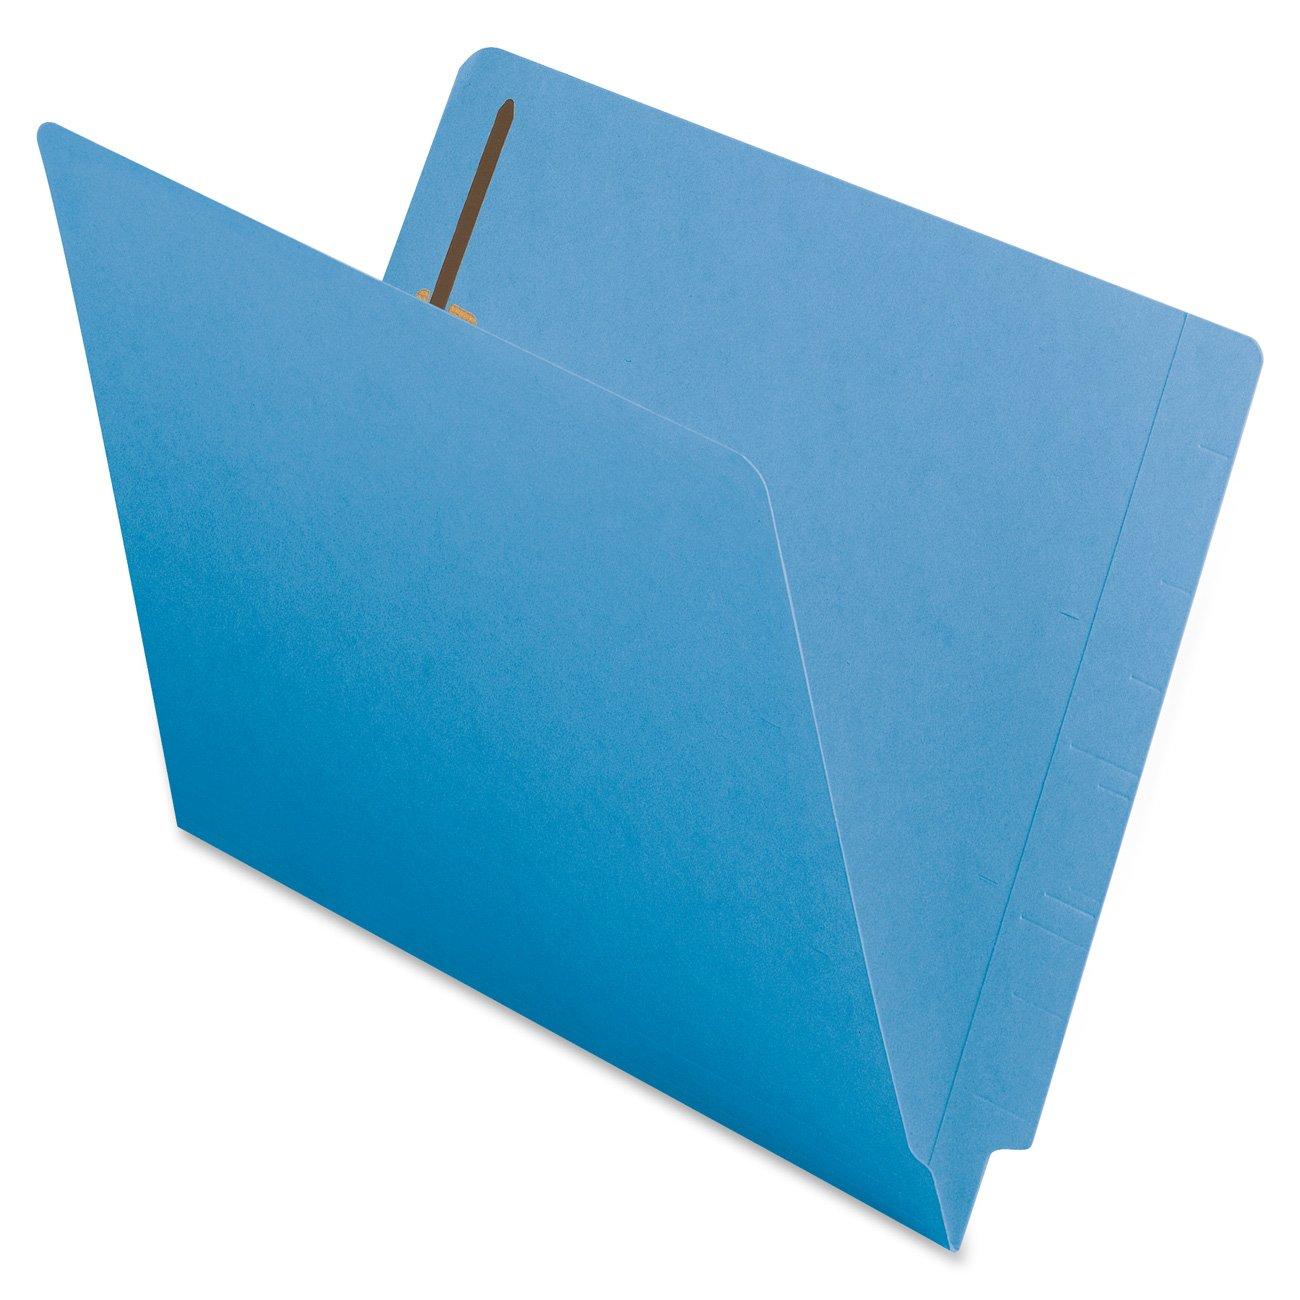 Smead End Tab Fastener File Folder, Shelf-Master Reinforced Straight-Cut Tab, 2 Fasteners, Letter Size, Blue, 50 per Box (25040) by Smead